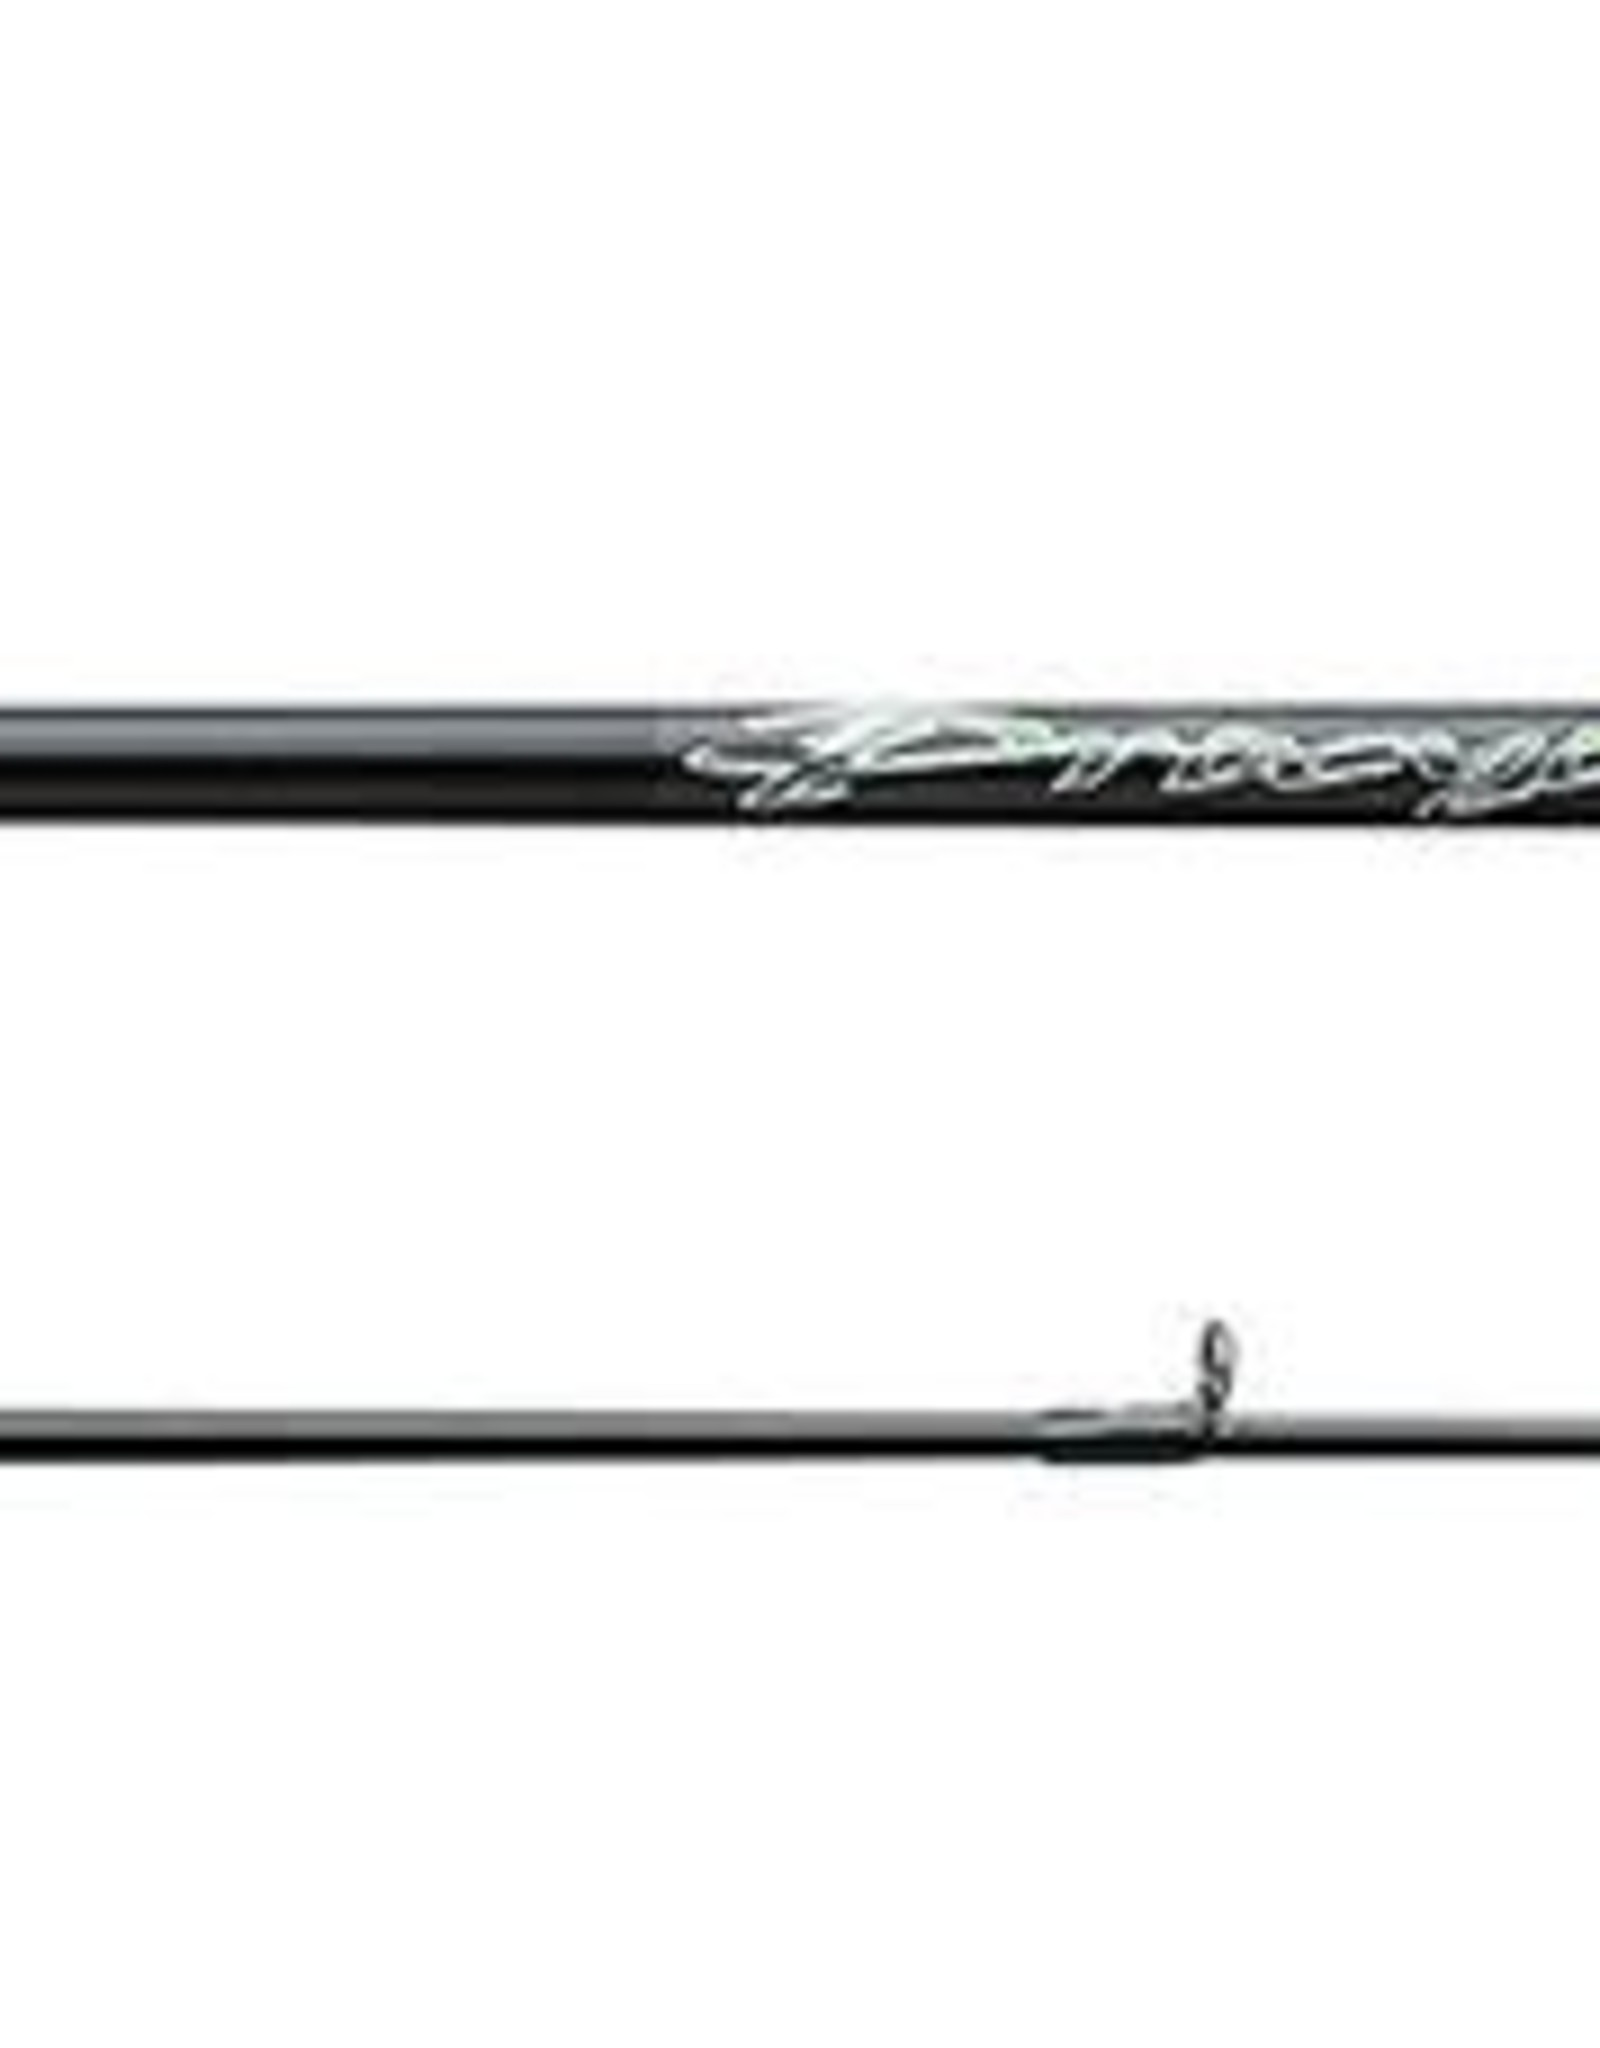 Daiwa Daiwa Procyon Baitcasting Rod